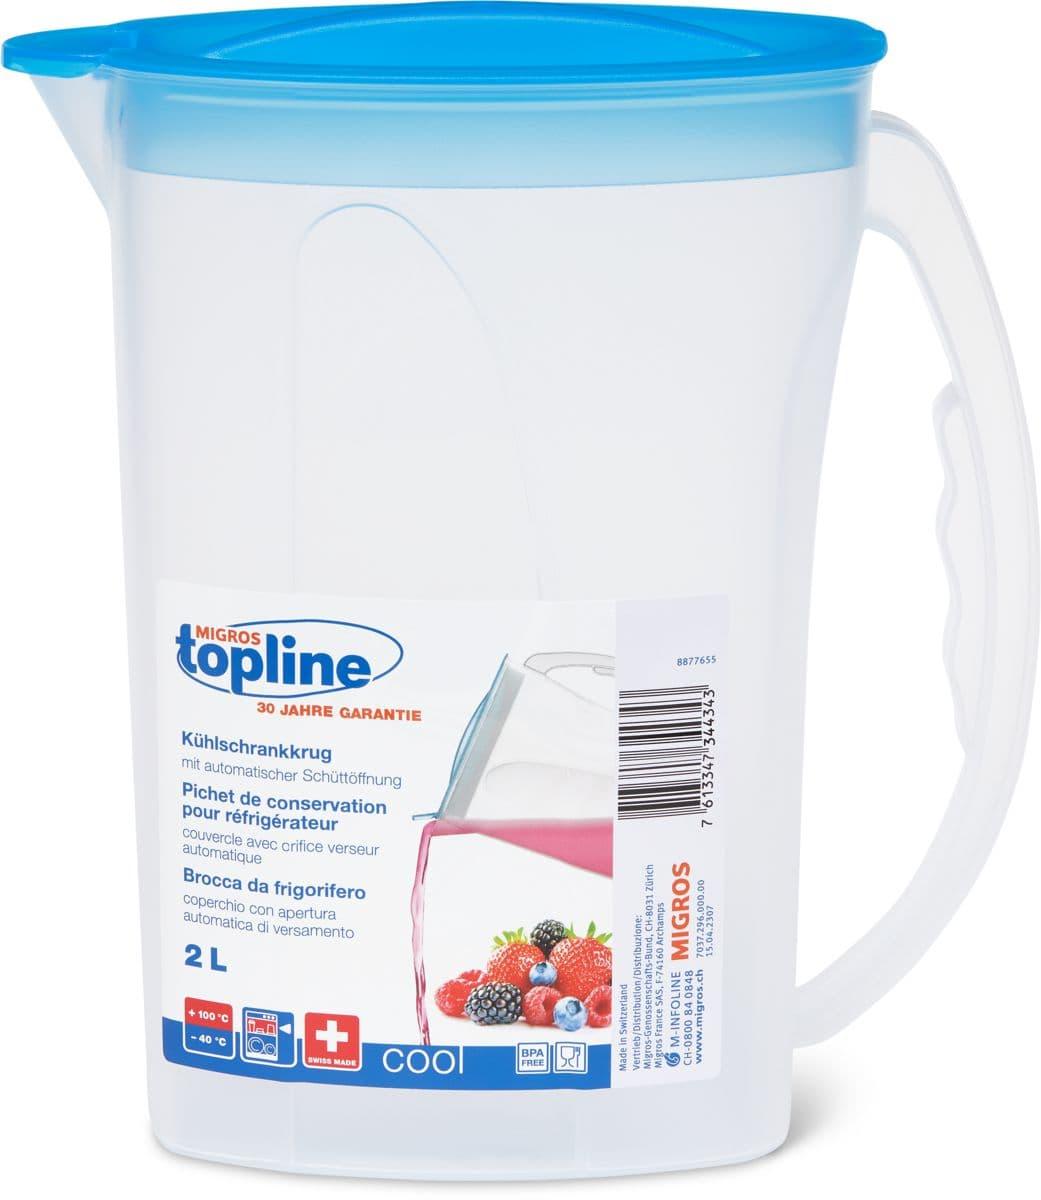 M-Topline Brocca per frigorifero 2.0L